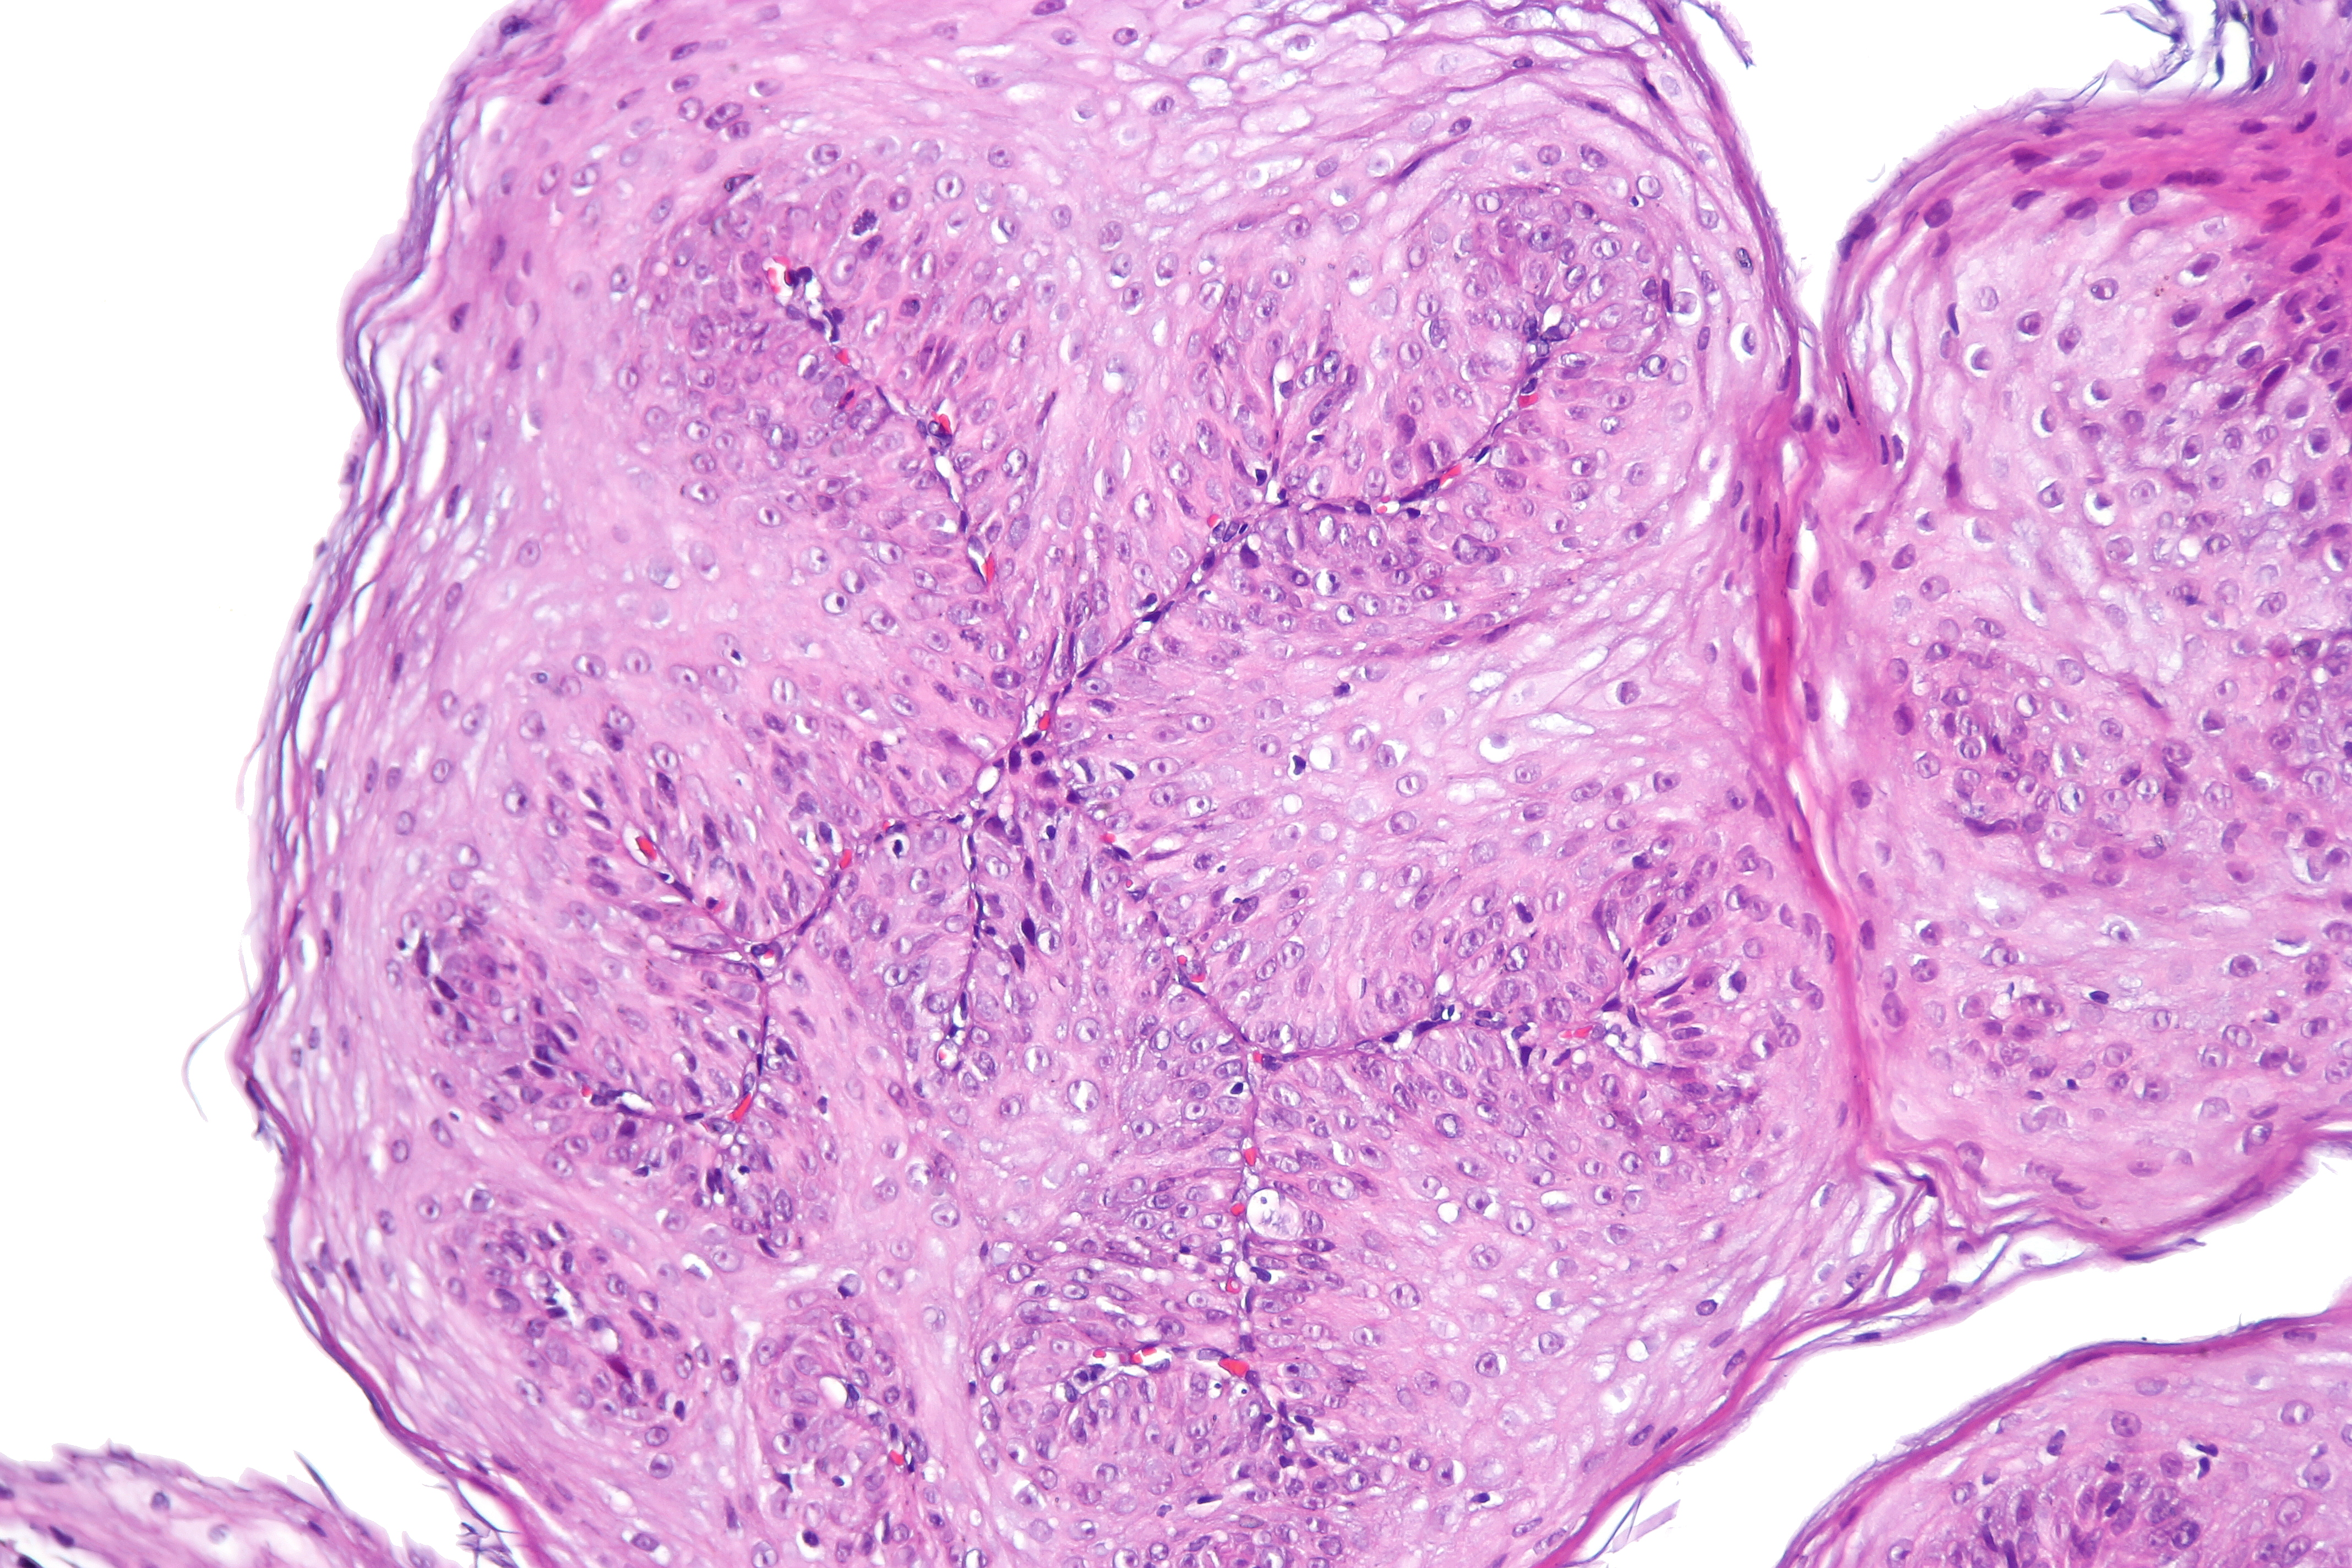 esophageal papilloma